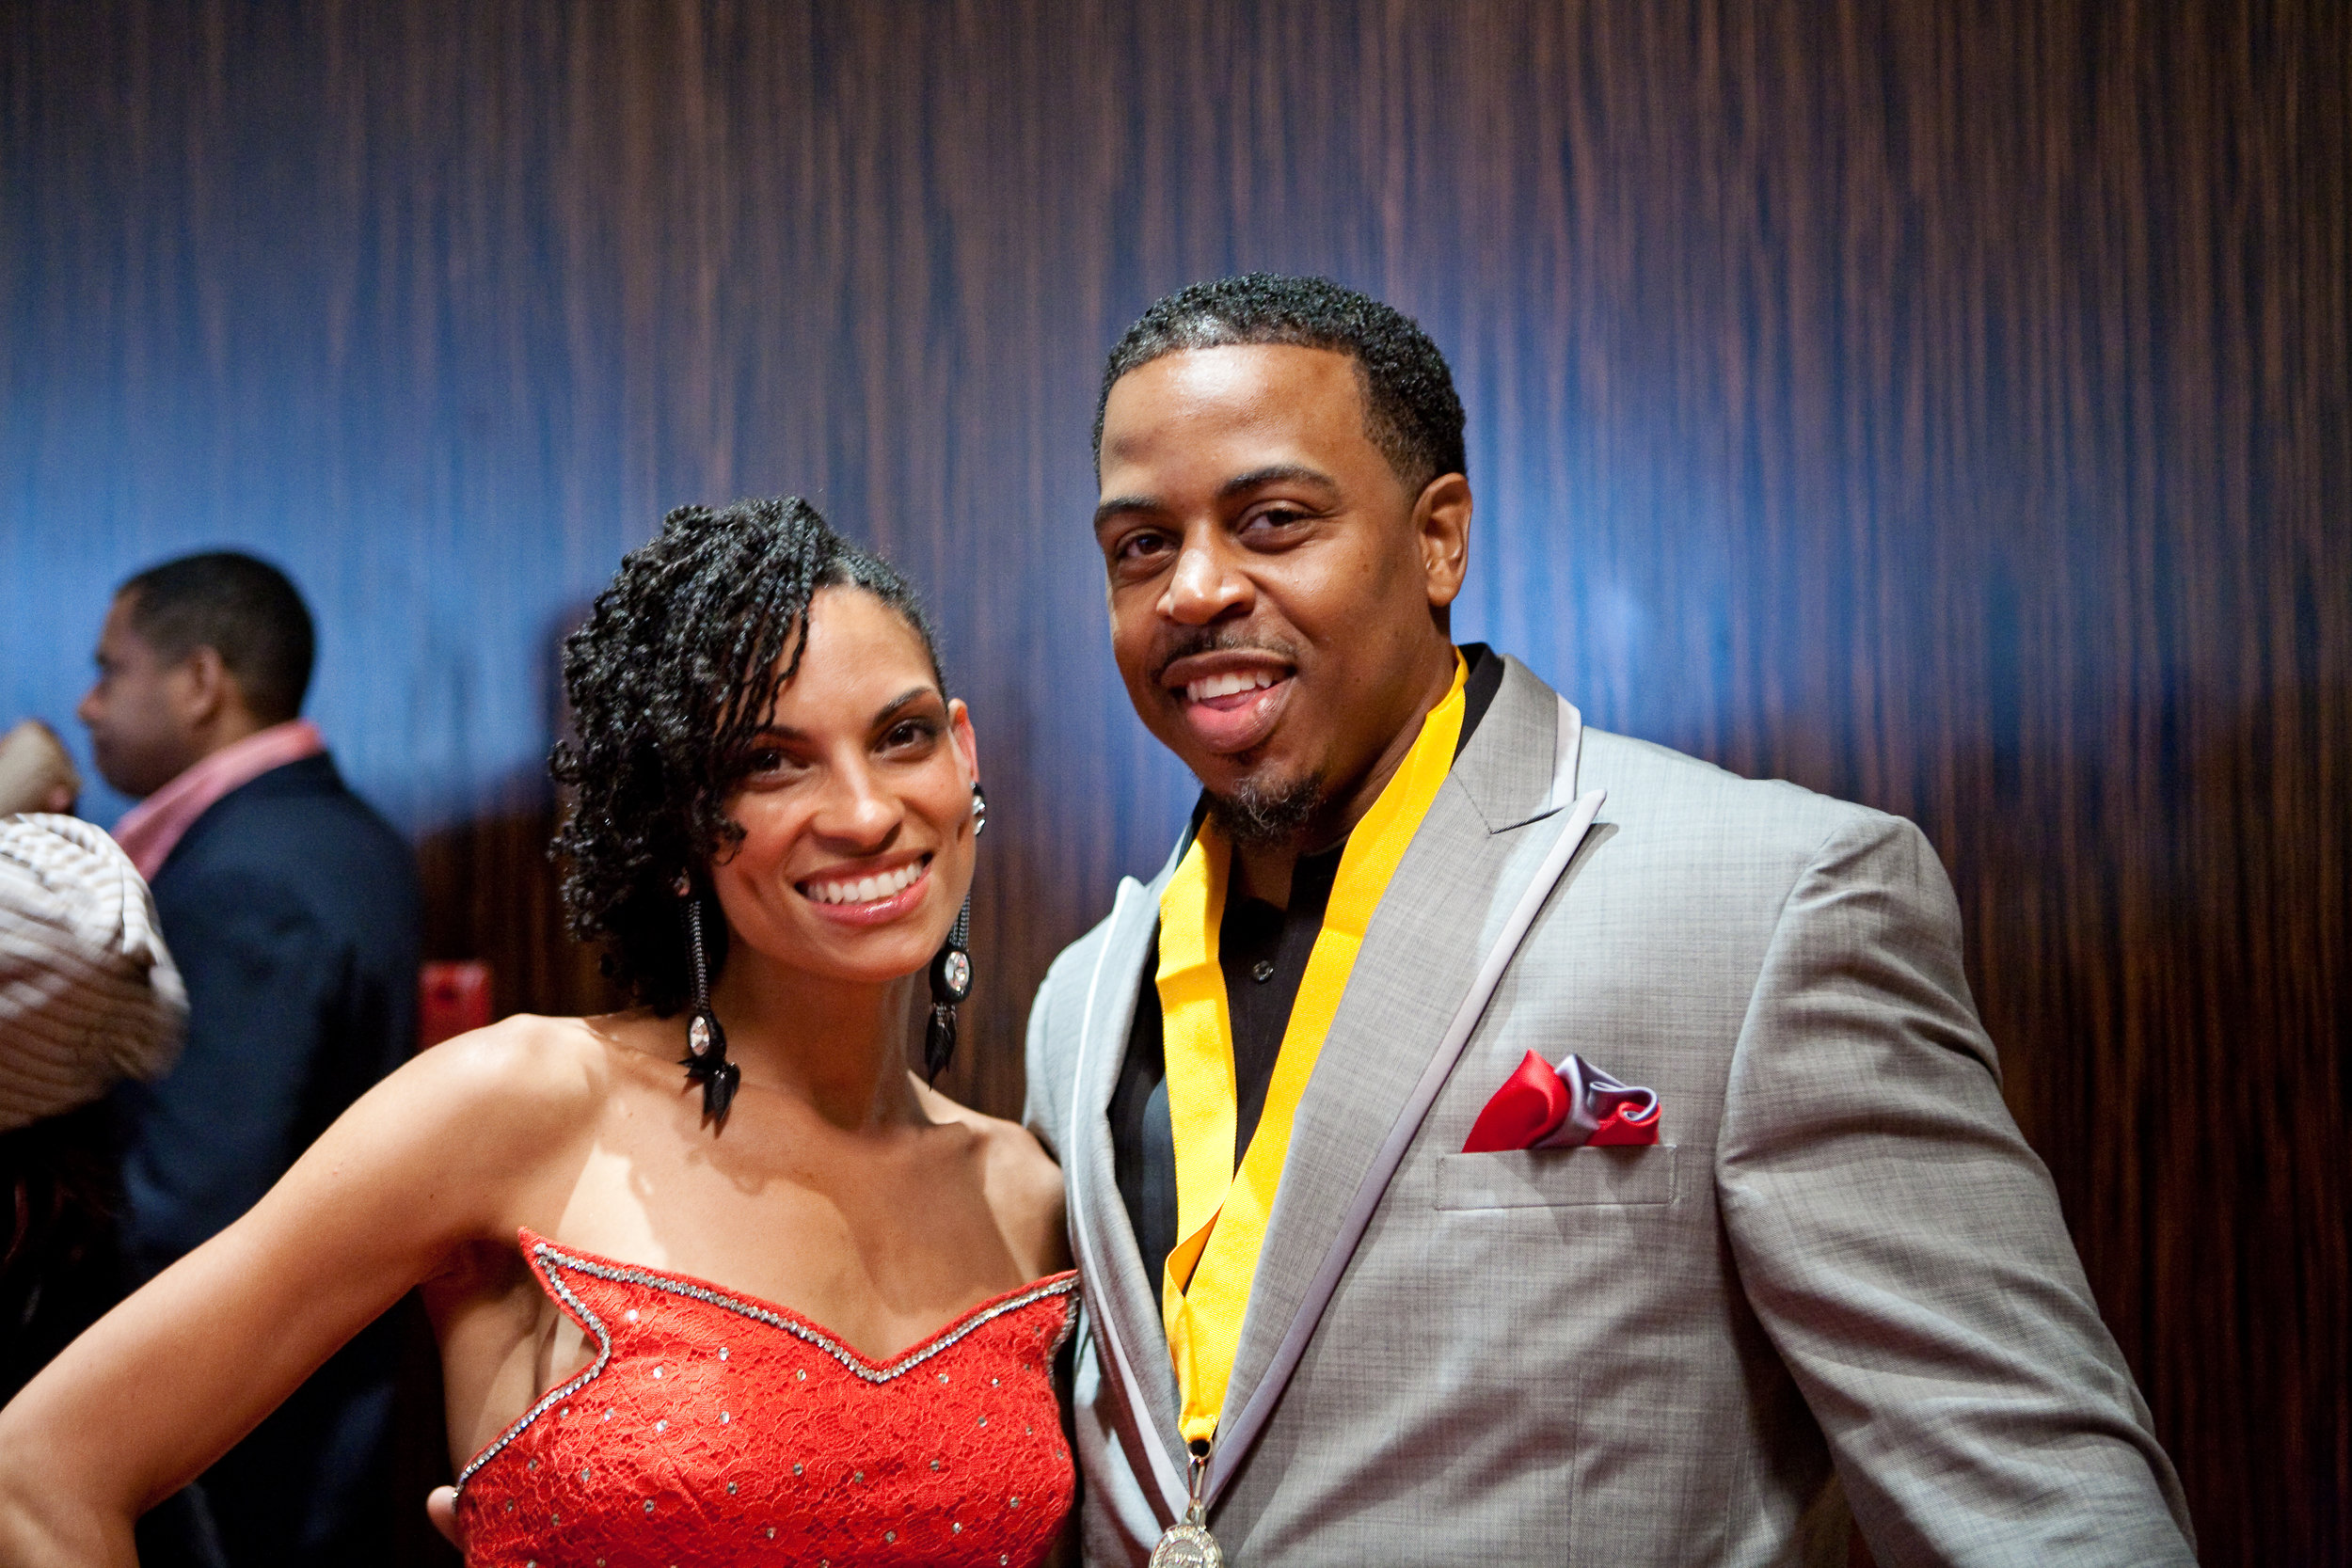 Estee @ ASCAP Rhythm & Soul Awards